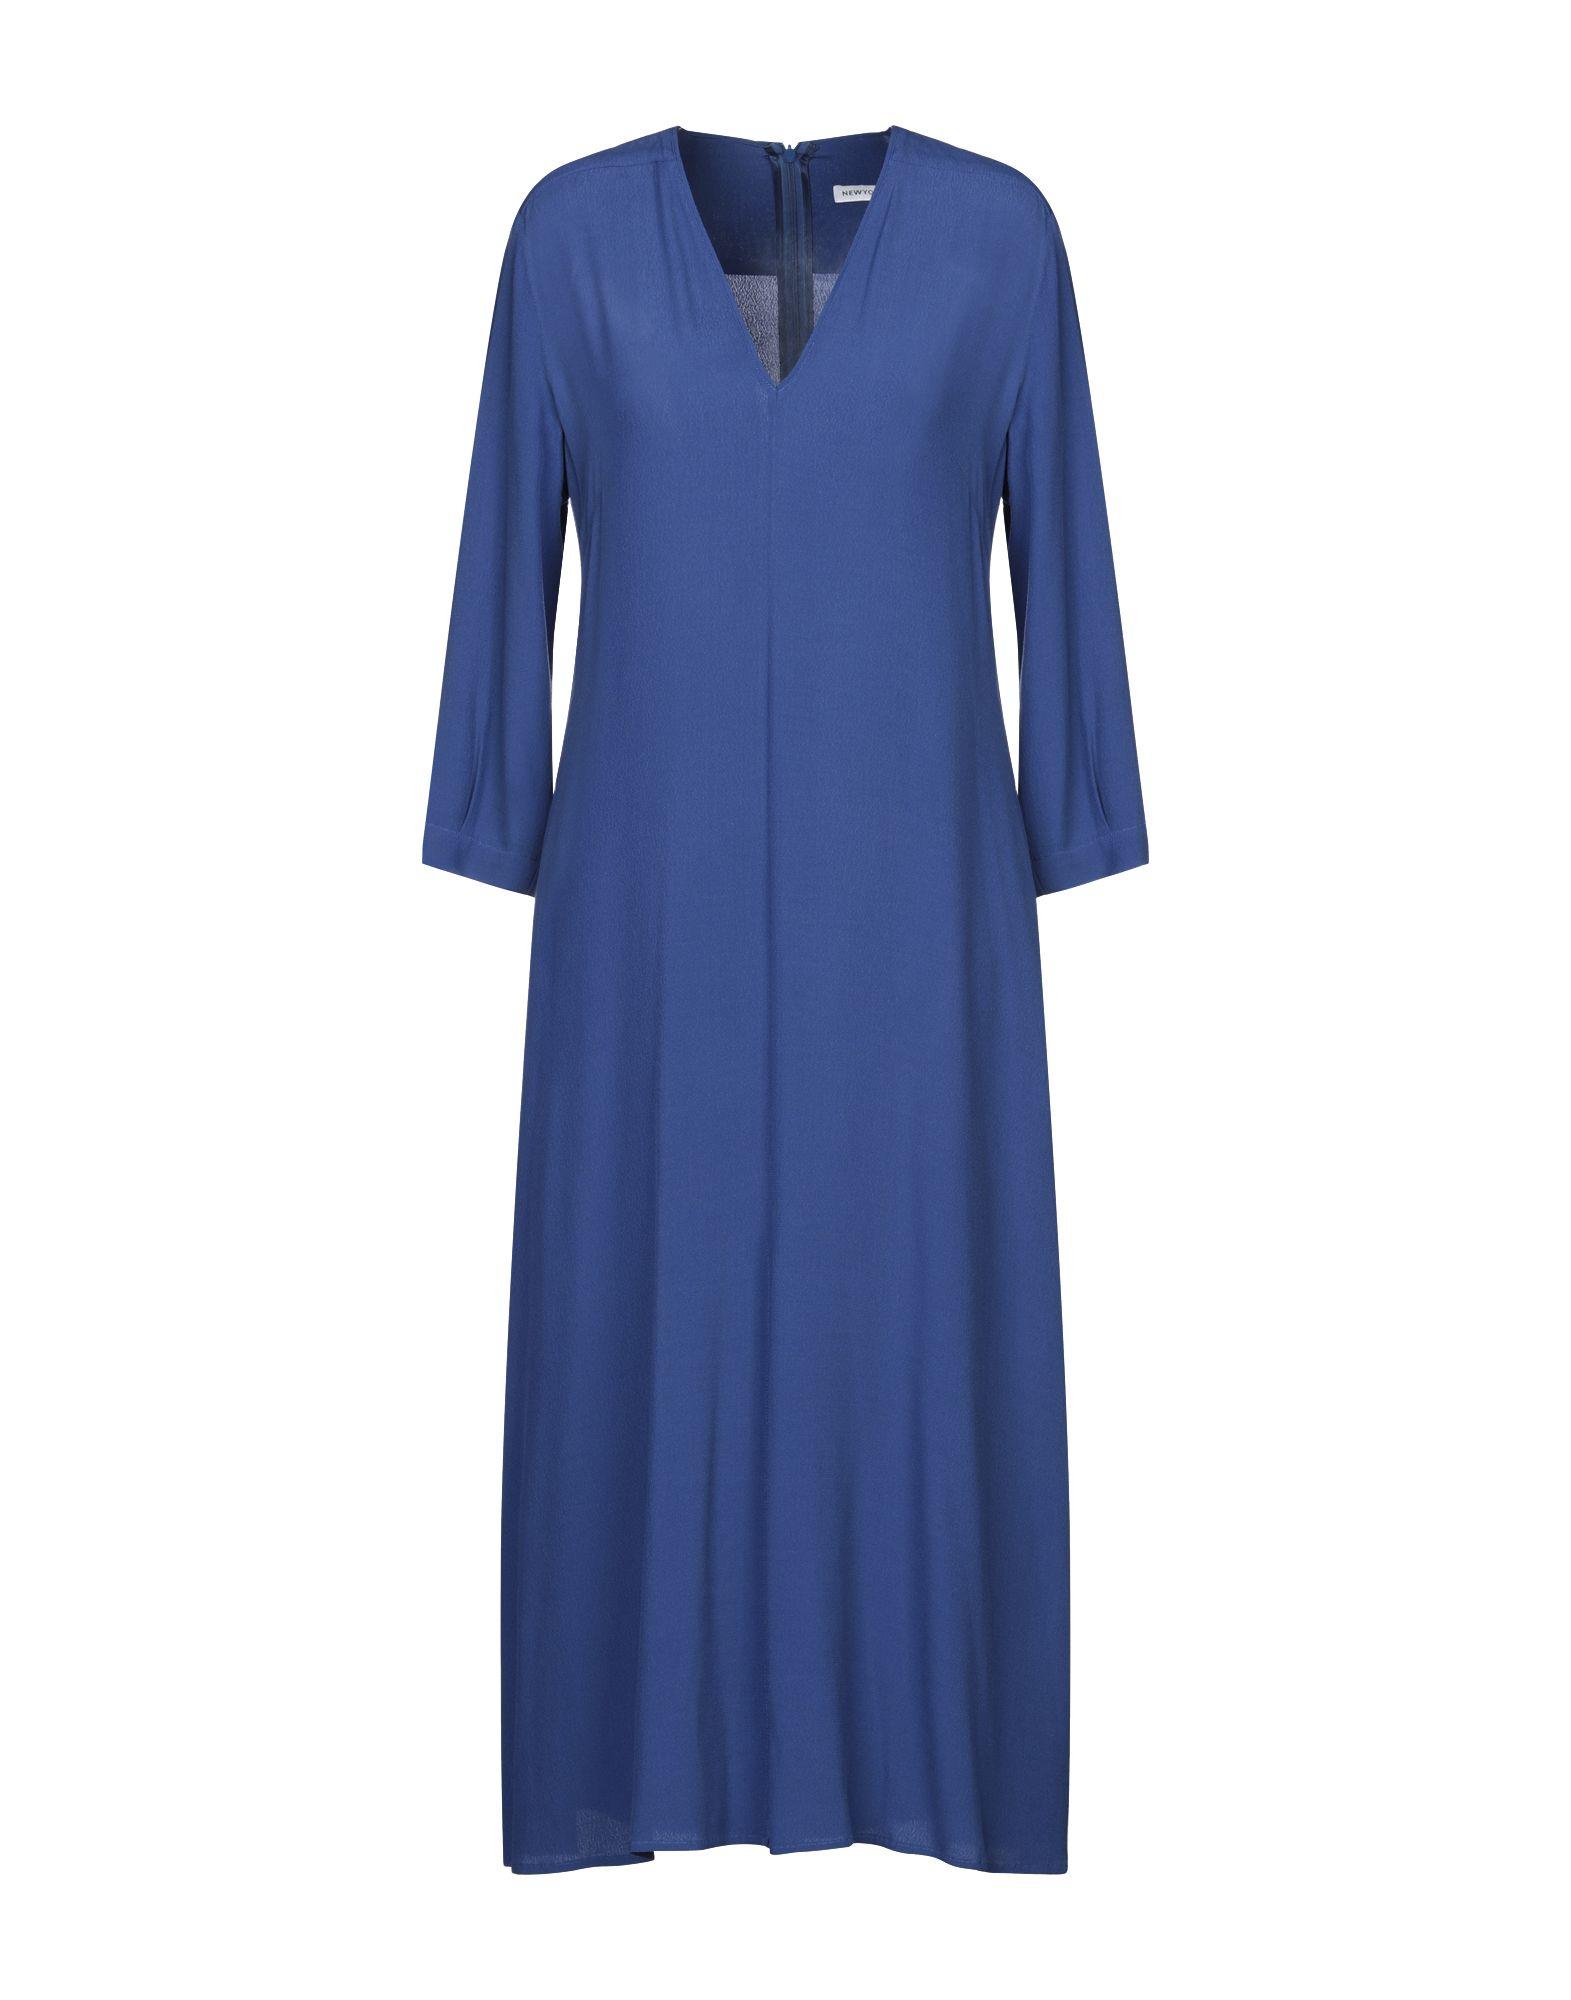 NEW YORK INDUSTRIE Платье длиной 3/4